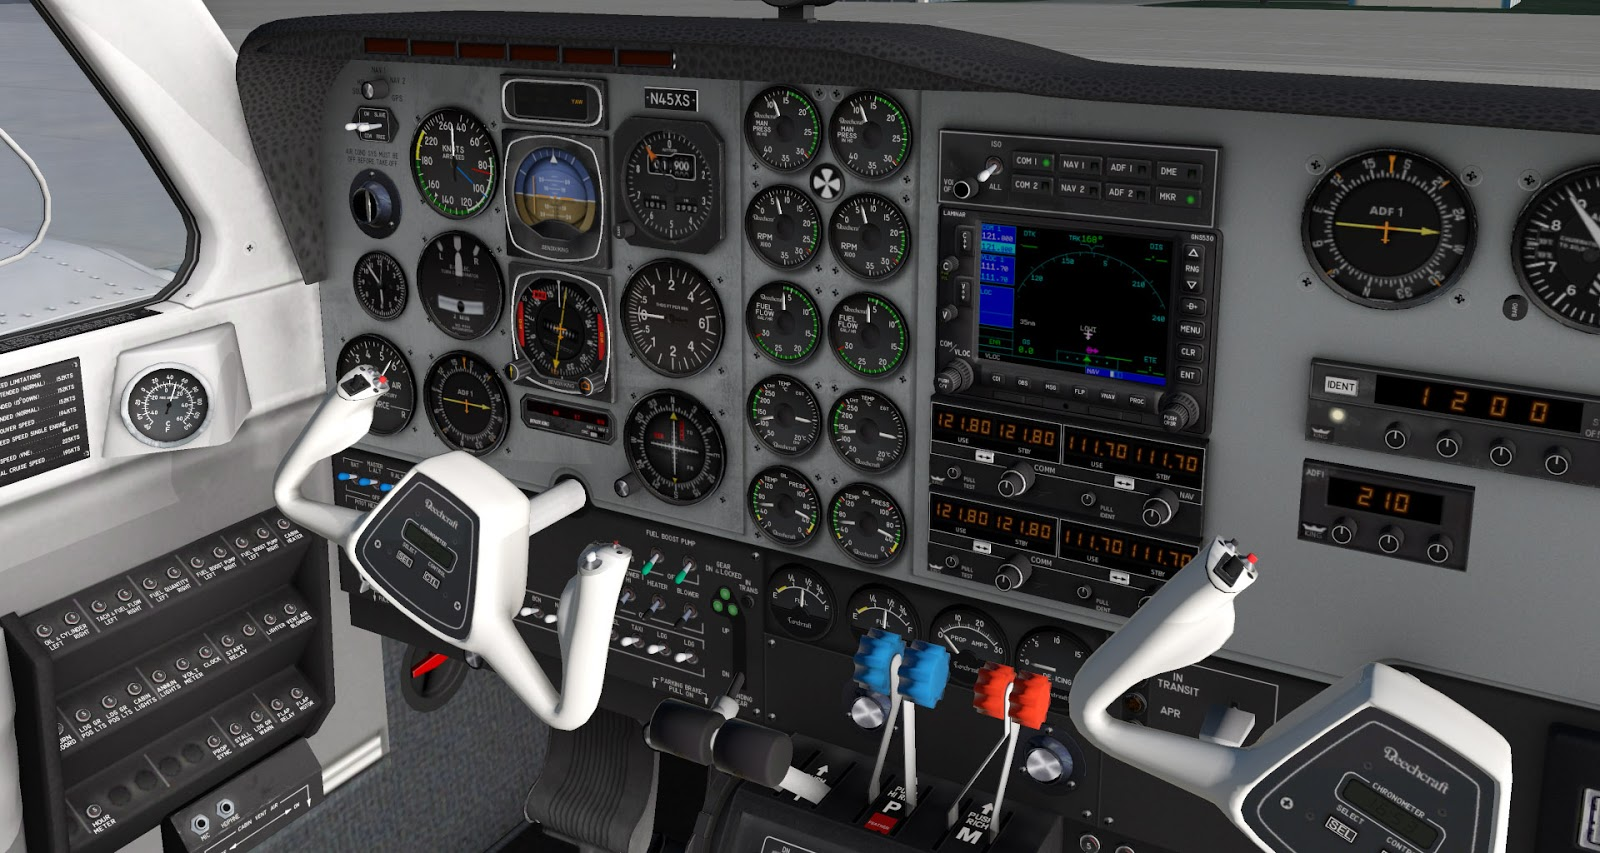 X-Plane 11 ESPAÑOL PC Full + Global Scenery DLC (CODEX) + REPACK 13 DVD5 (JPW) 9